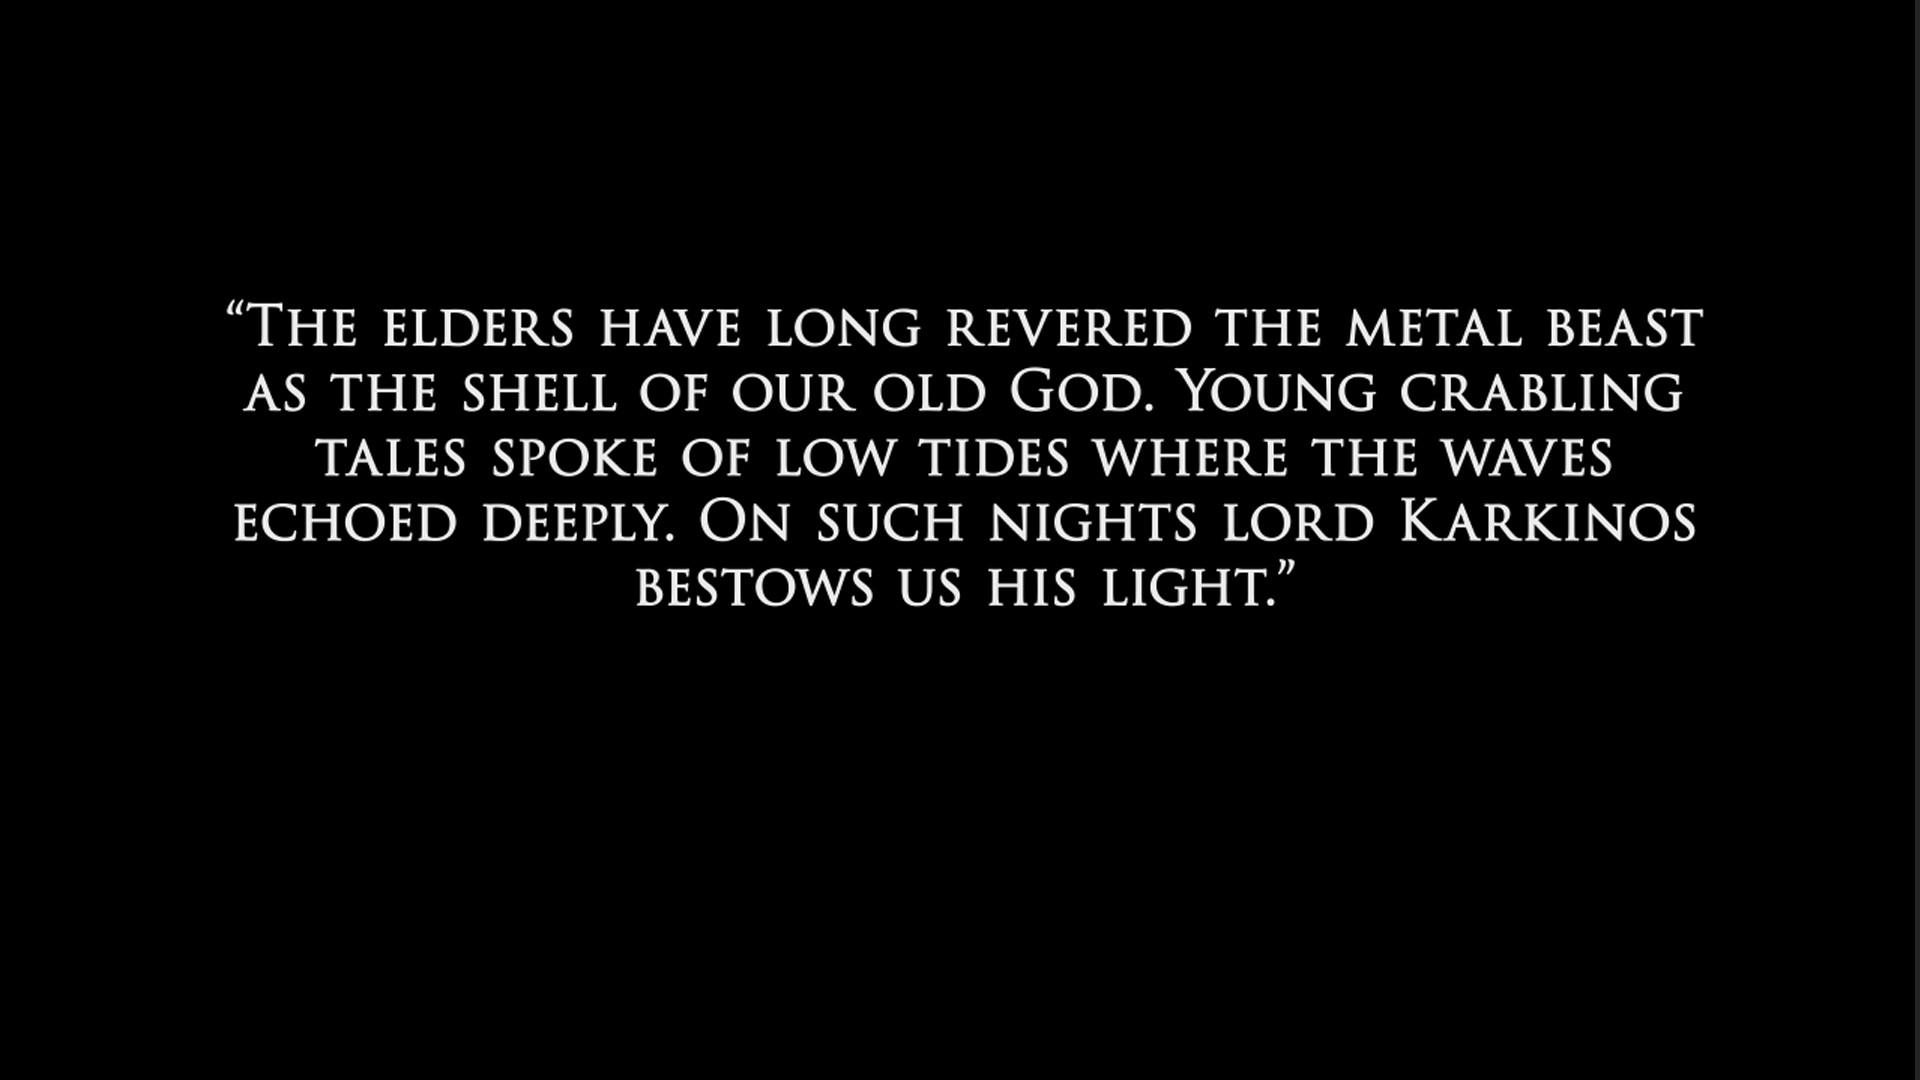 Martin pietras text 1